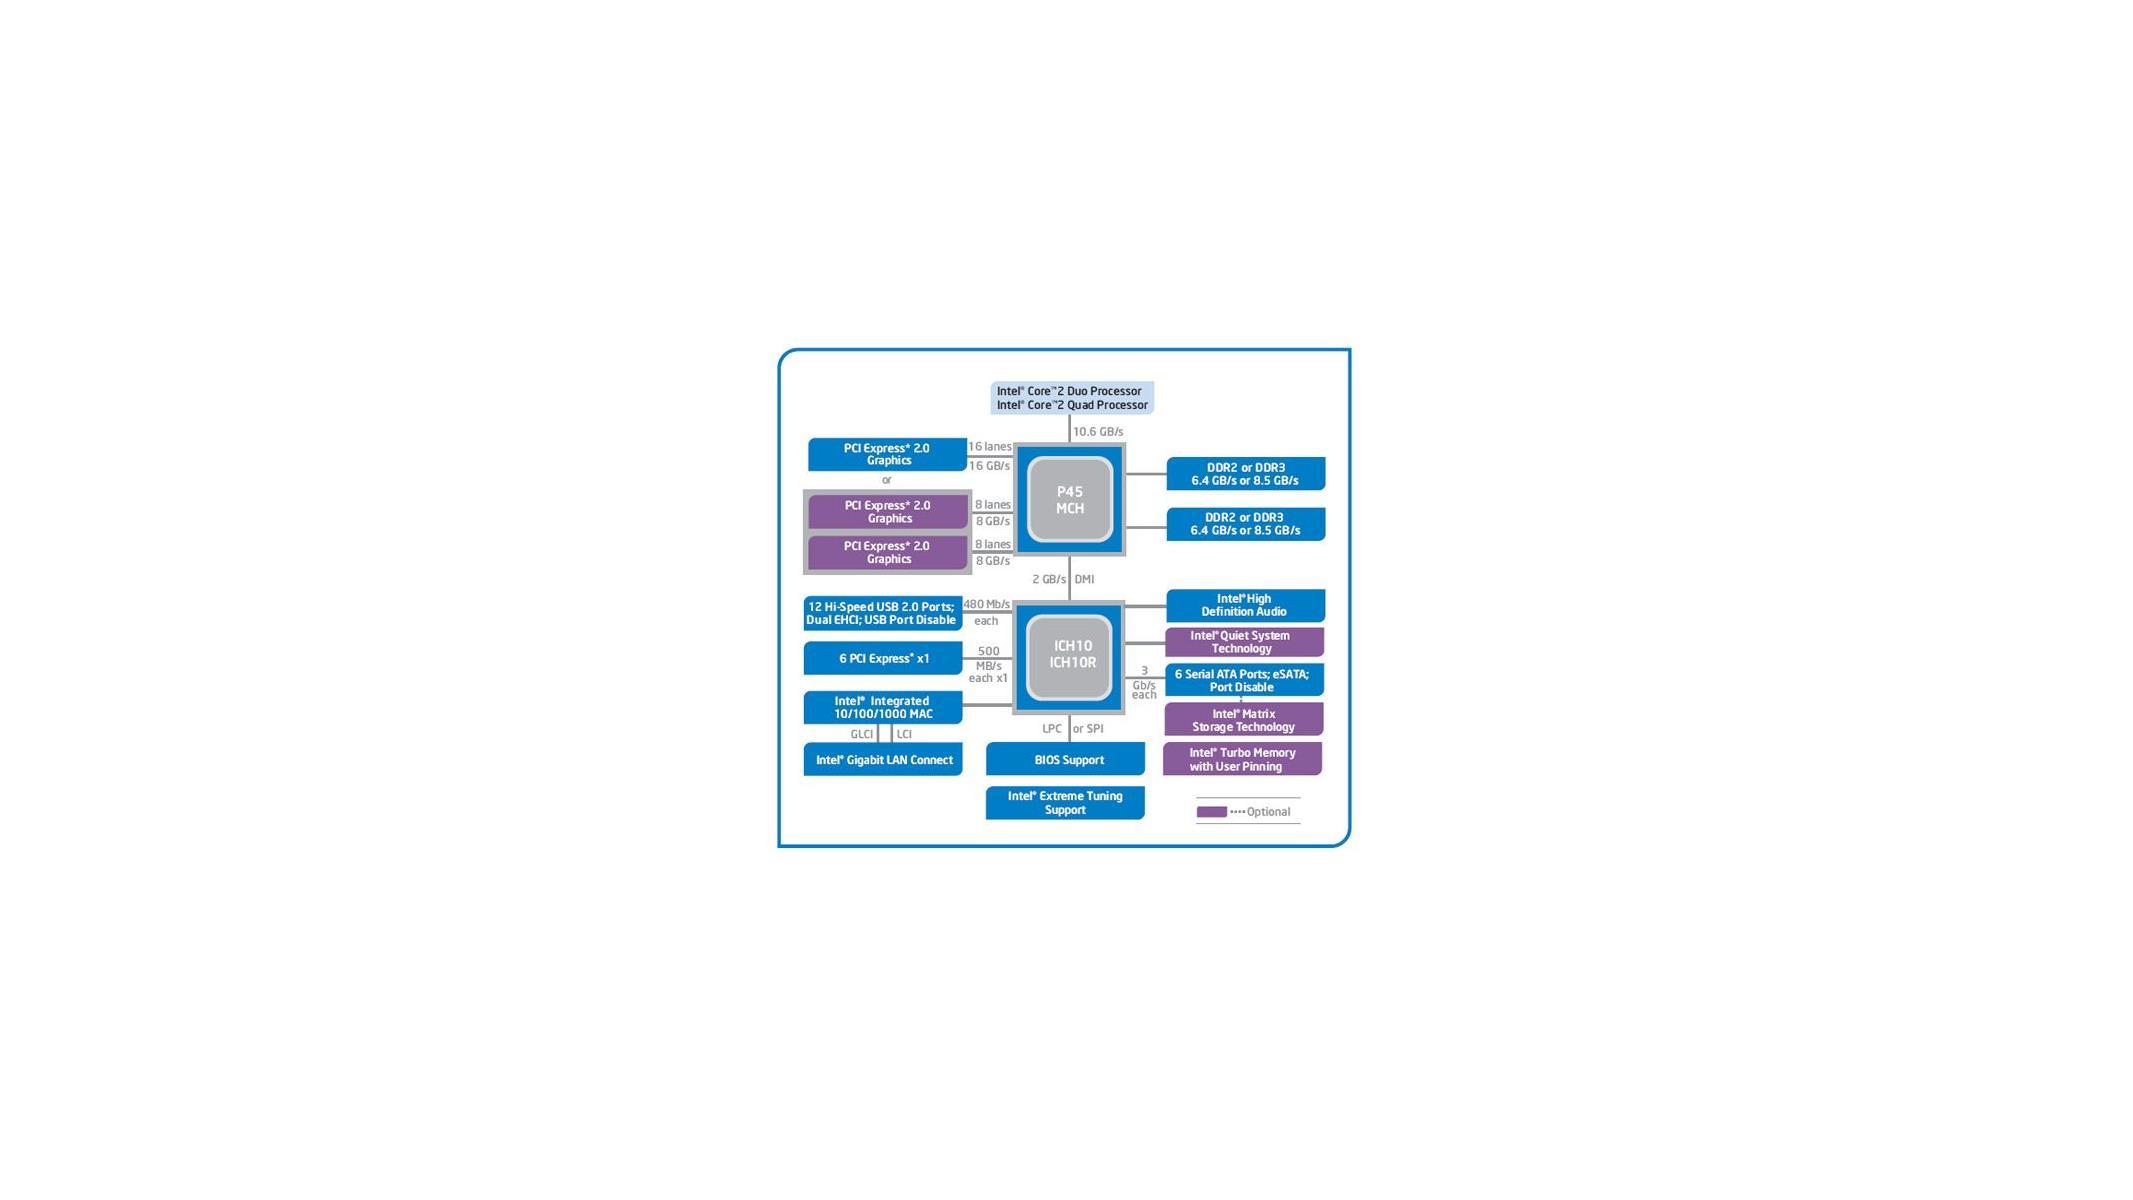 Asus Maximus II Formula Intel P45 Motherboard - Page 3 | HotHardware